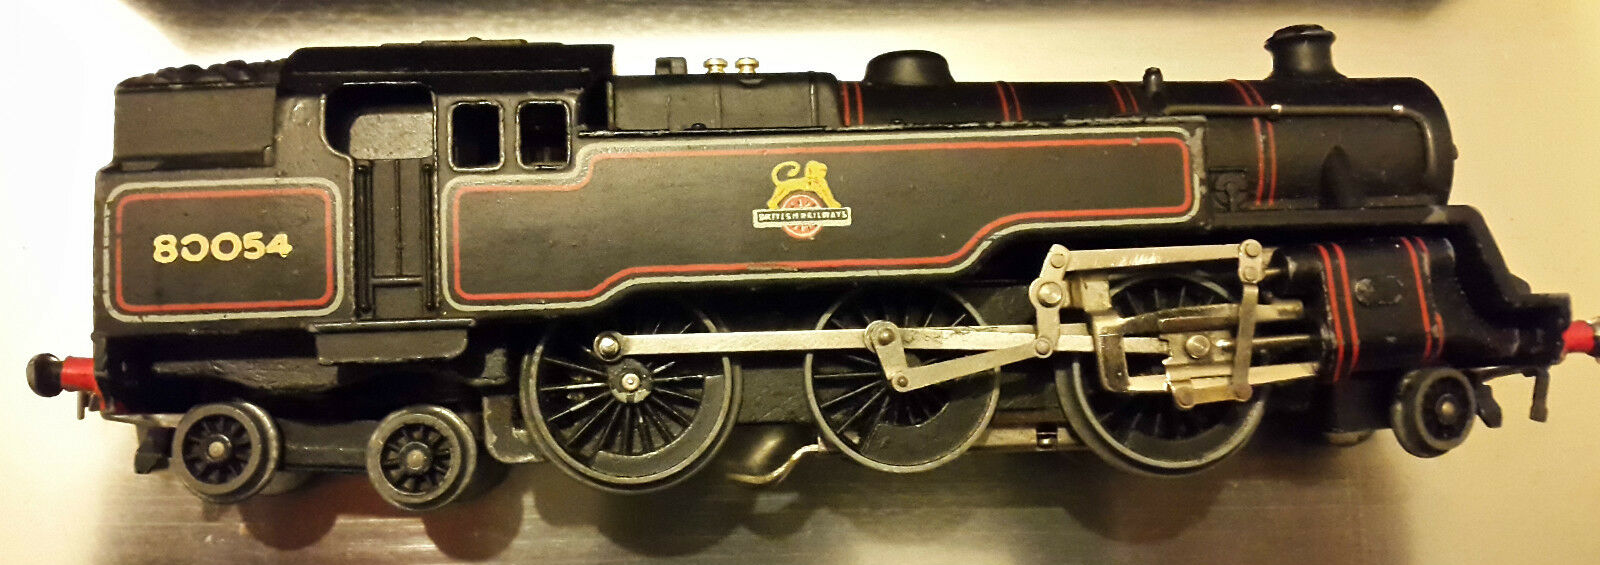 Vintage Hornby Dublo EDL18 Standard  2-6-4 Tank Locomotive in Box